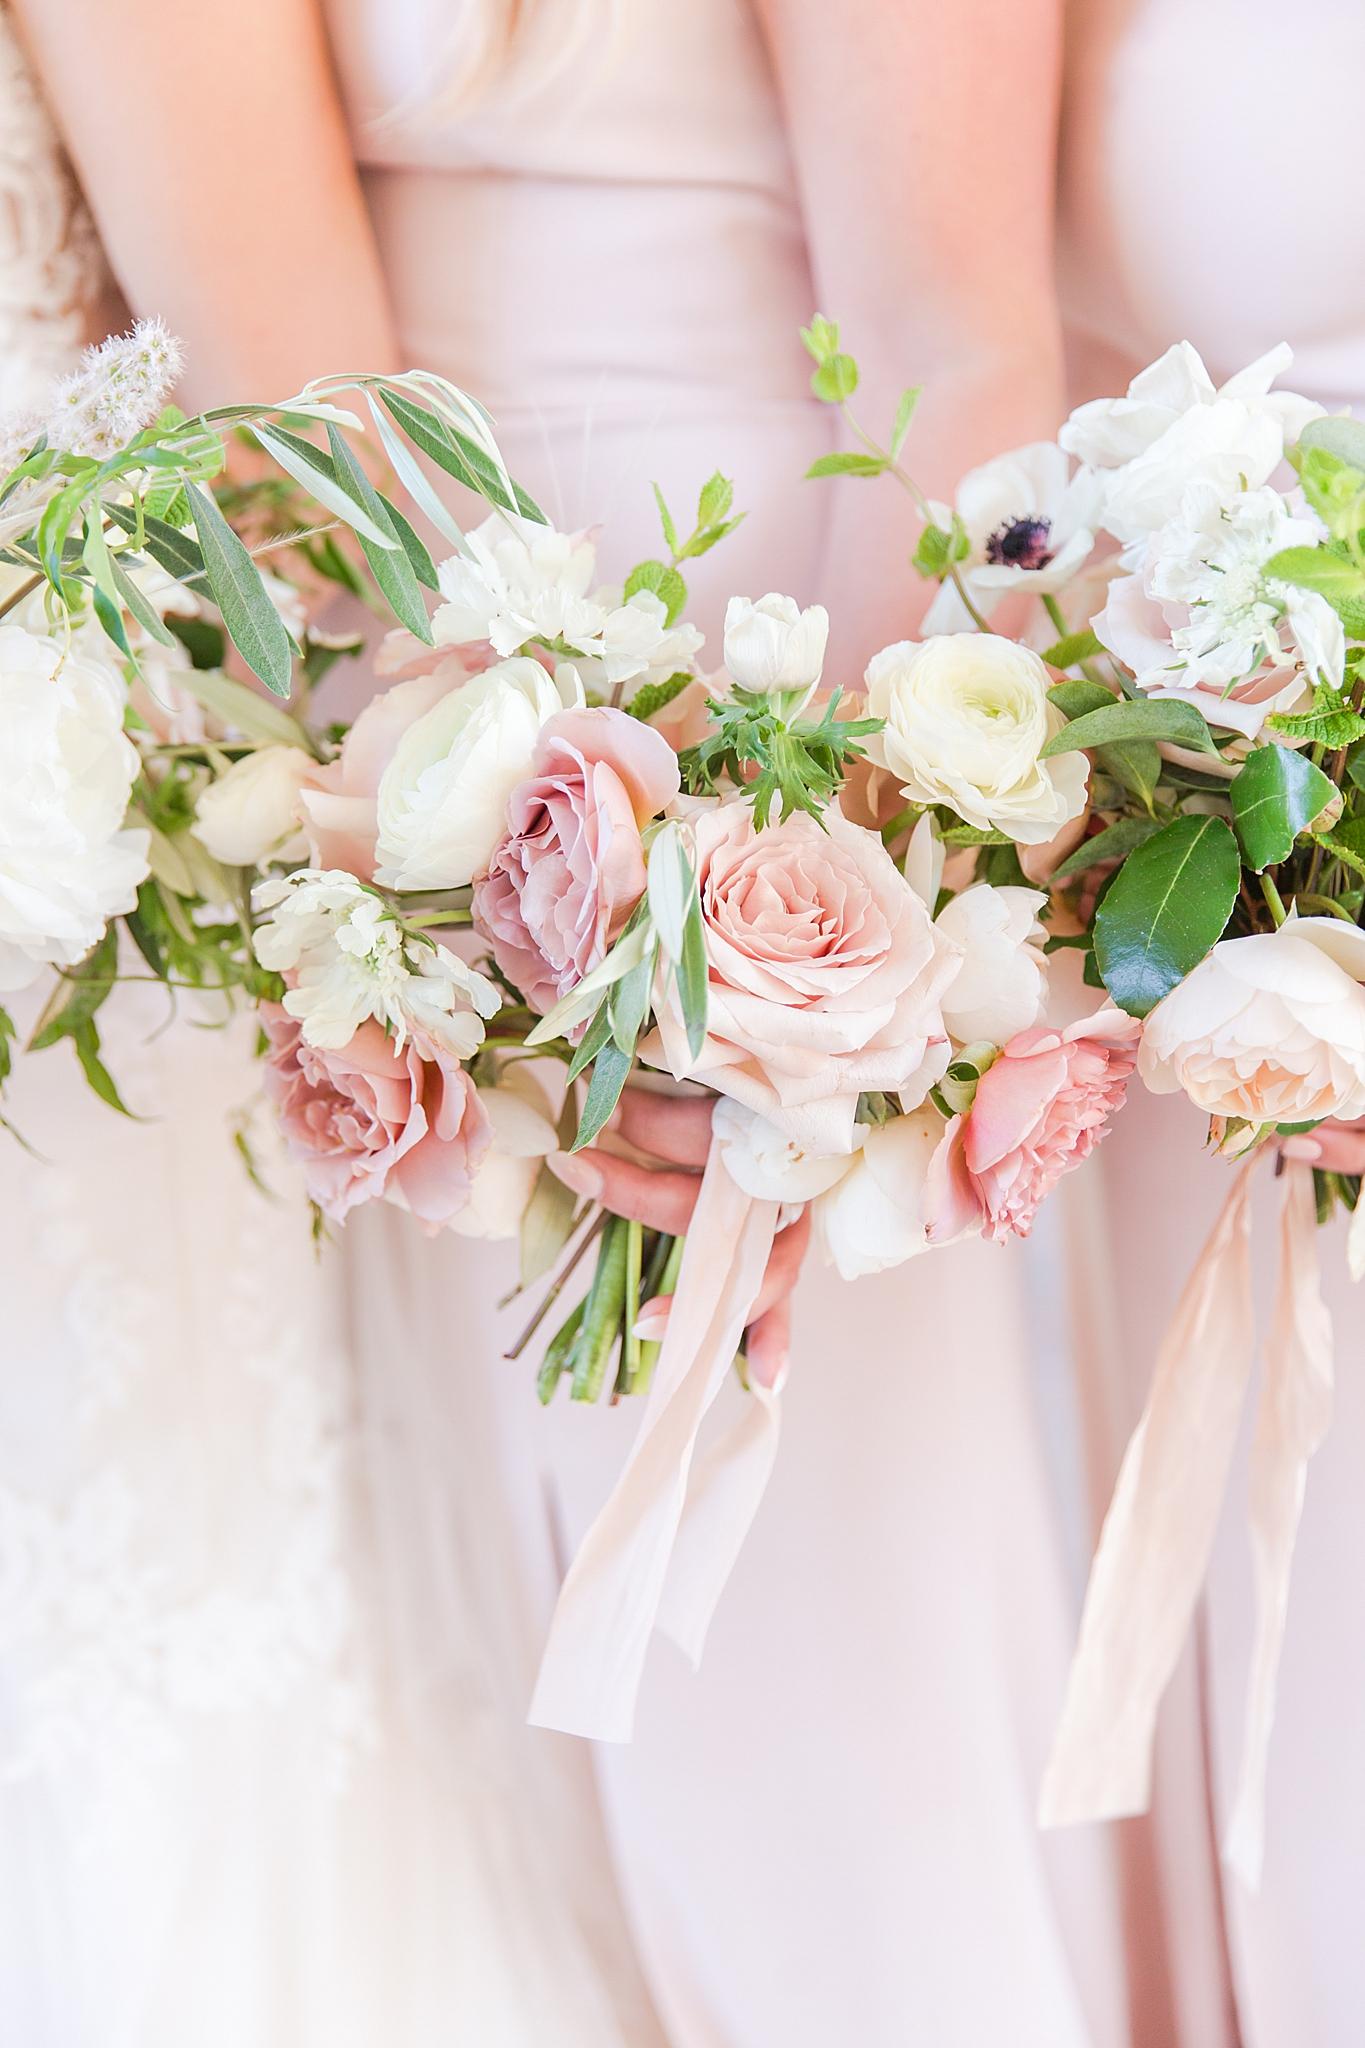 detroit-wedding-photographer-ann-arbor-chicago-by-courtney-carolyn-photography_0018.jpg